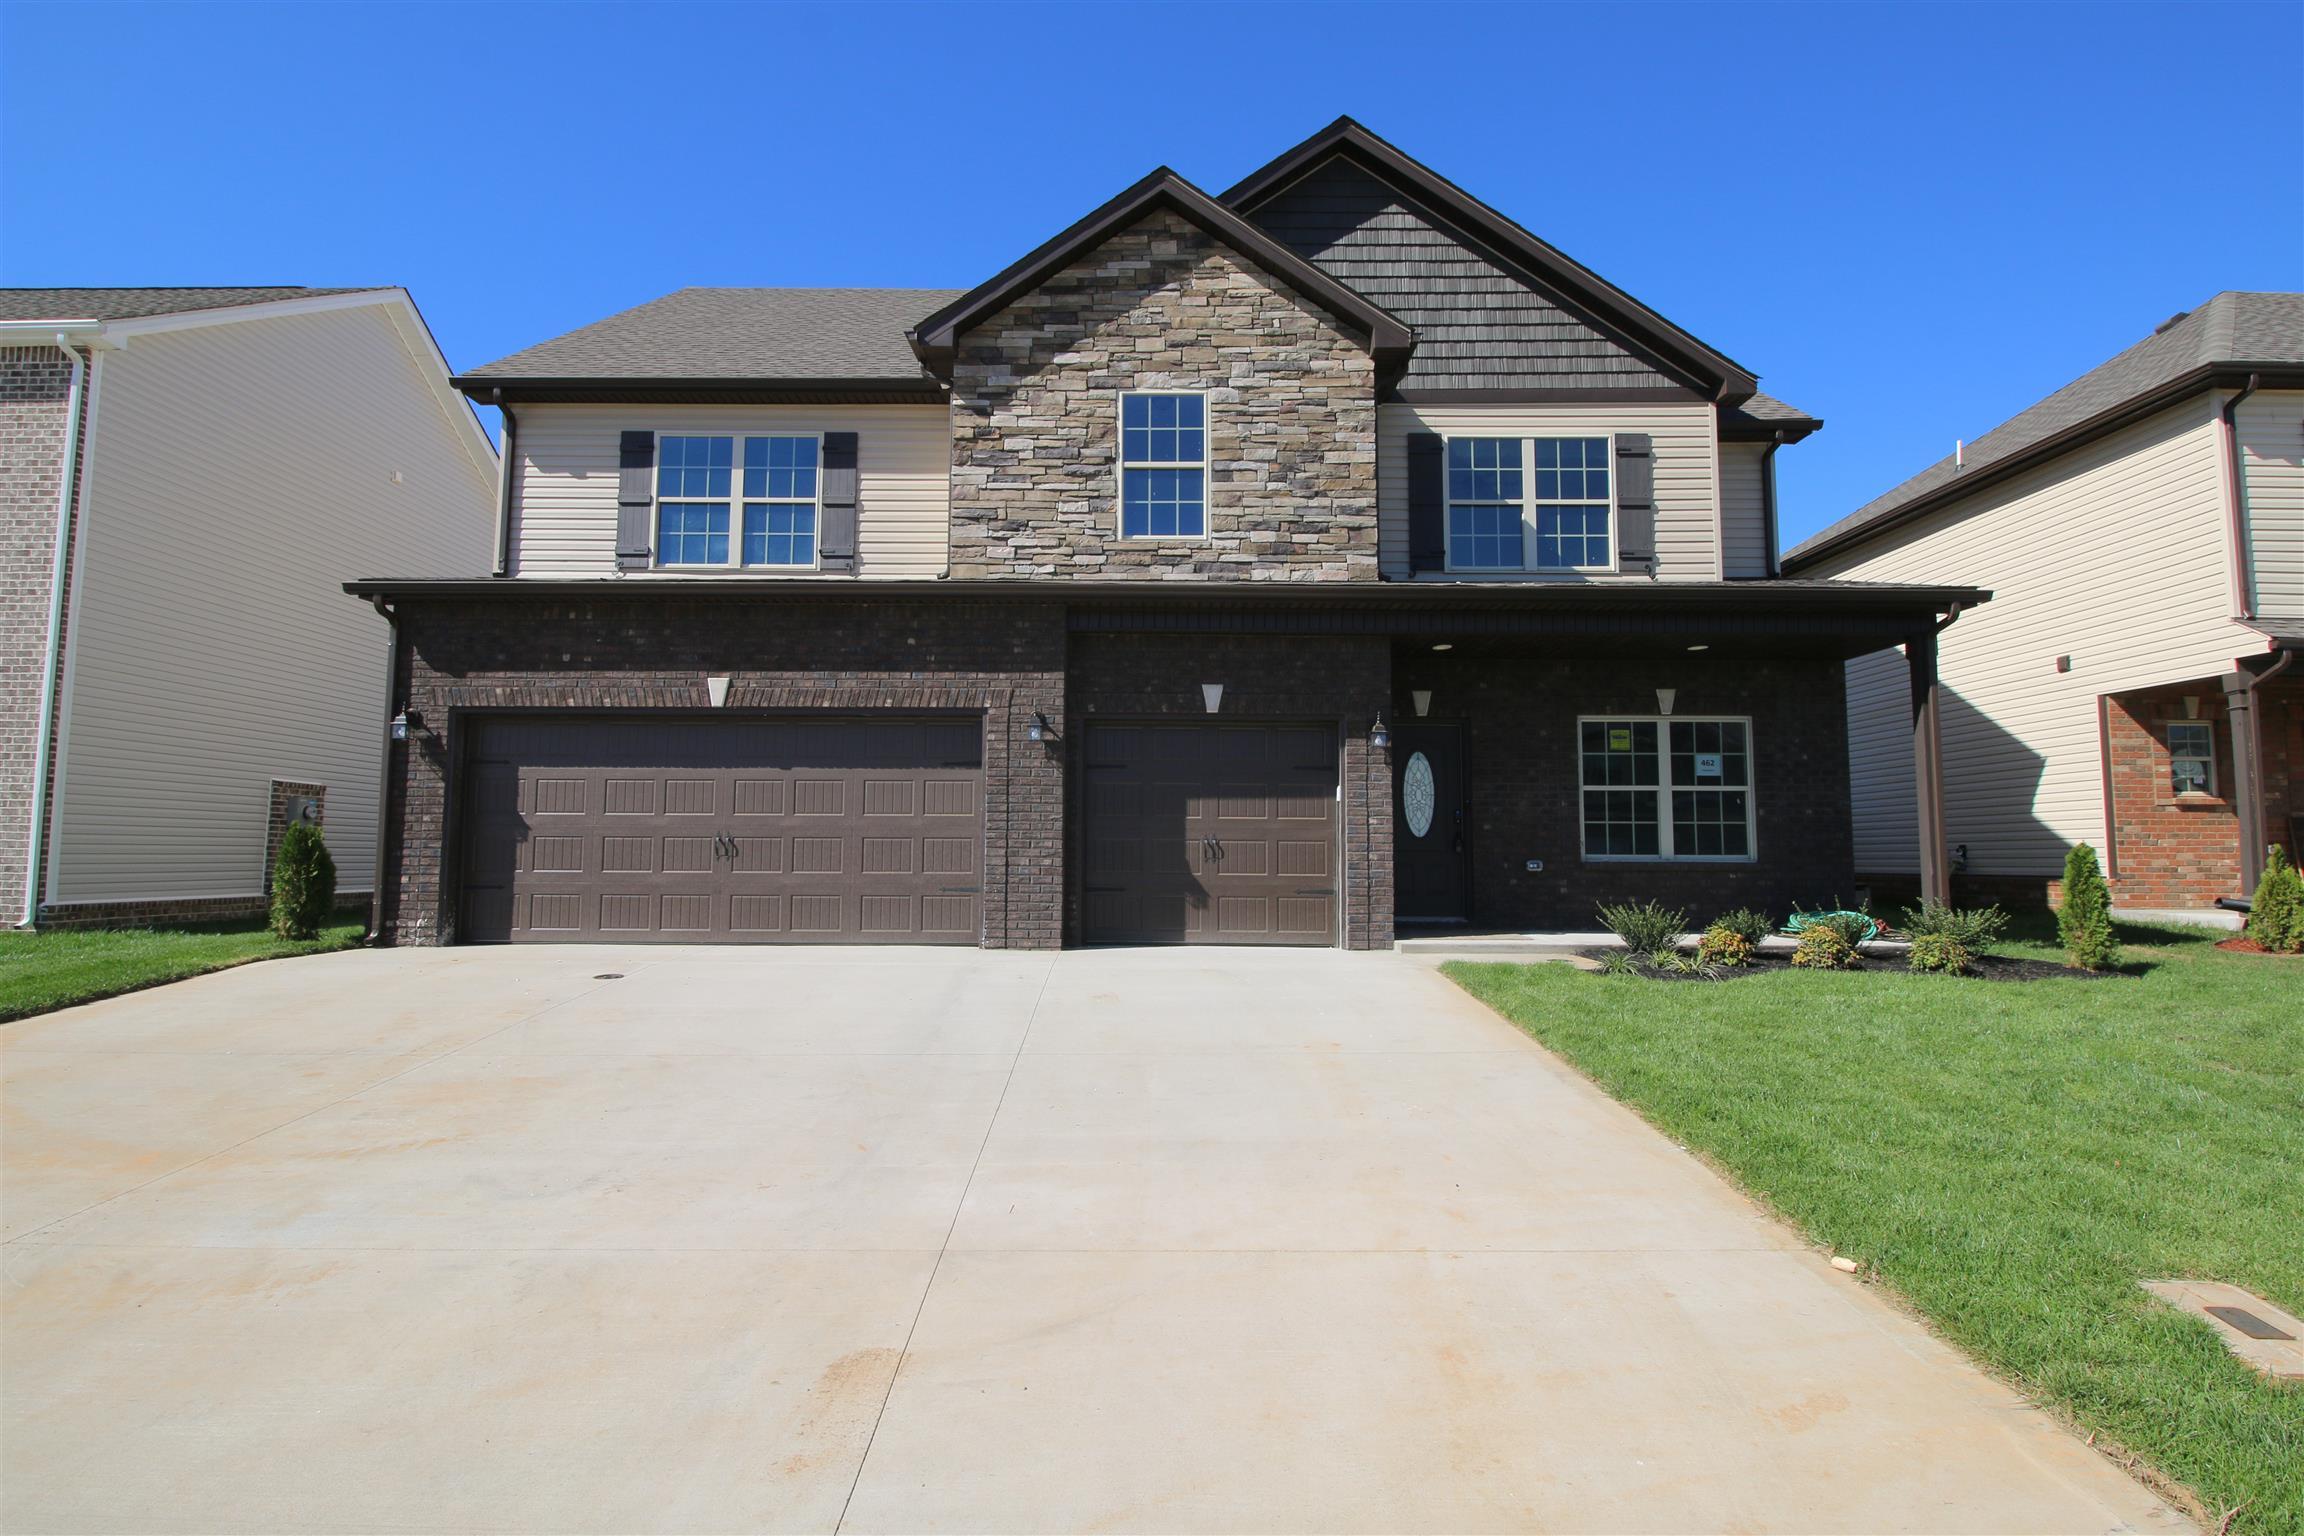 462 Summerfield, Clarksville, TN 37040 - Clarksville, TN real estate listing